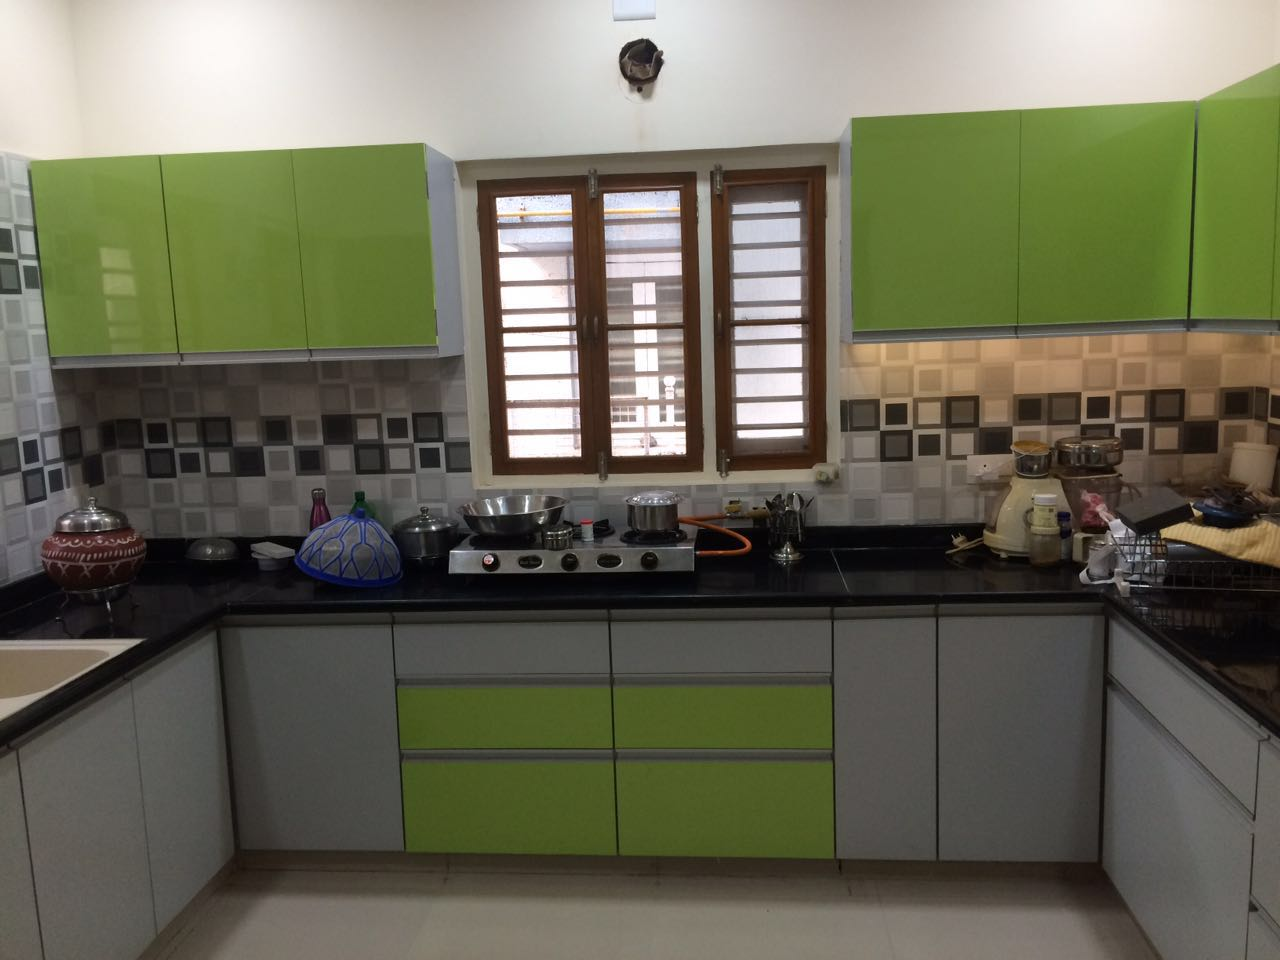 Olive Green And Grey Themed Modular Kitchen by Nirav Gor Modular-kitchen | Interior Design Photos & Ideas